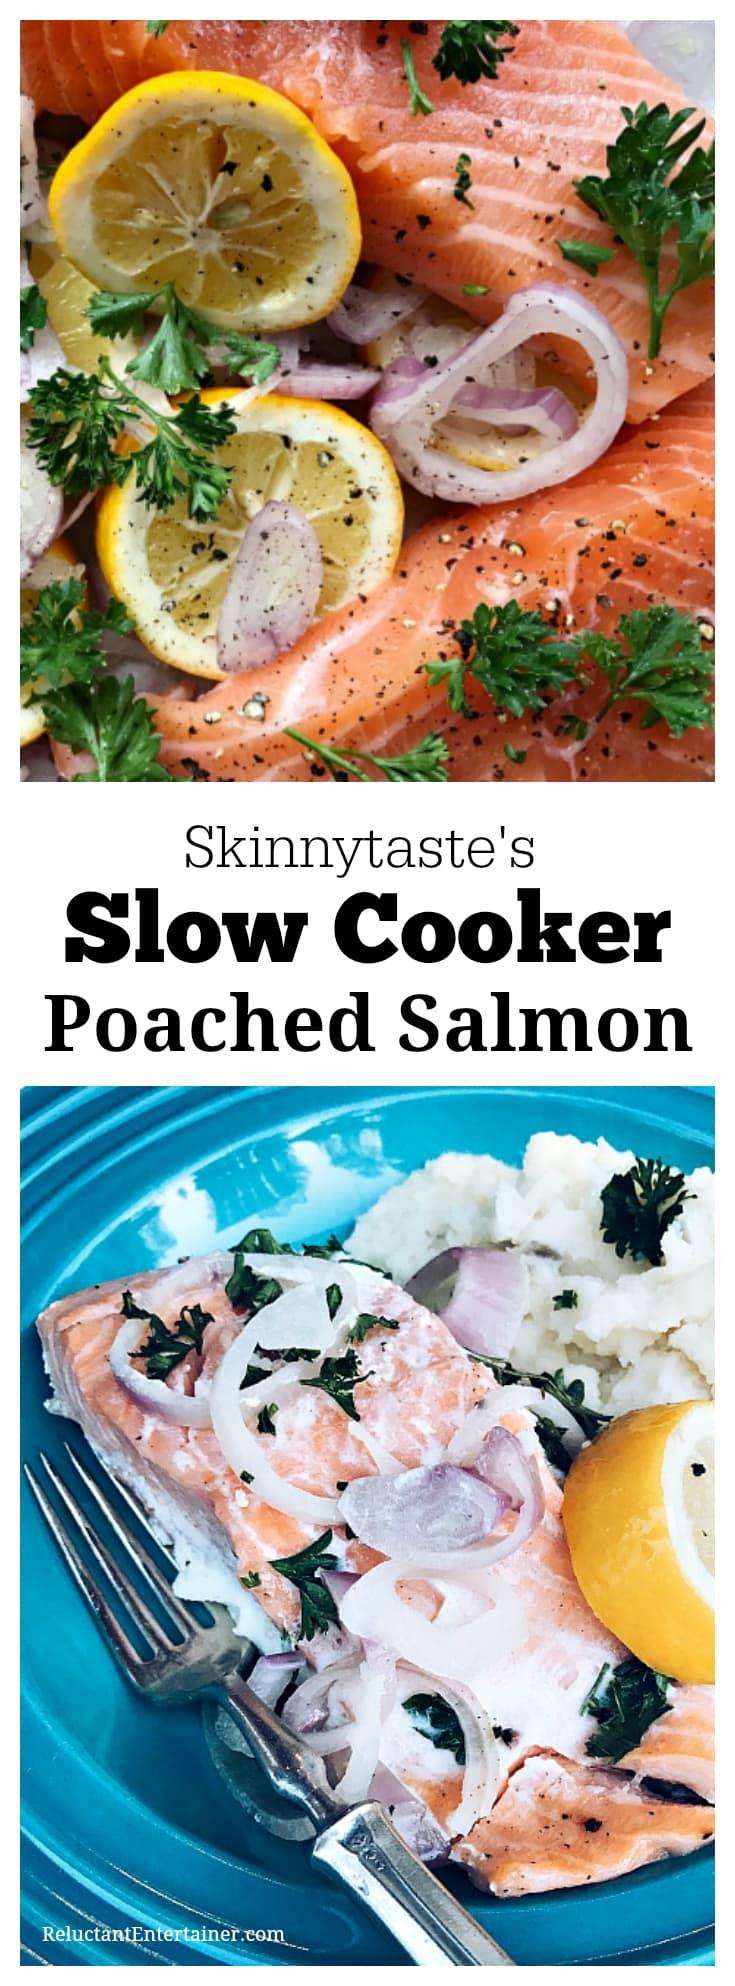 Skinnytaste's Slow Cooker Poached Salmon